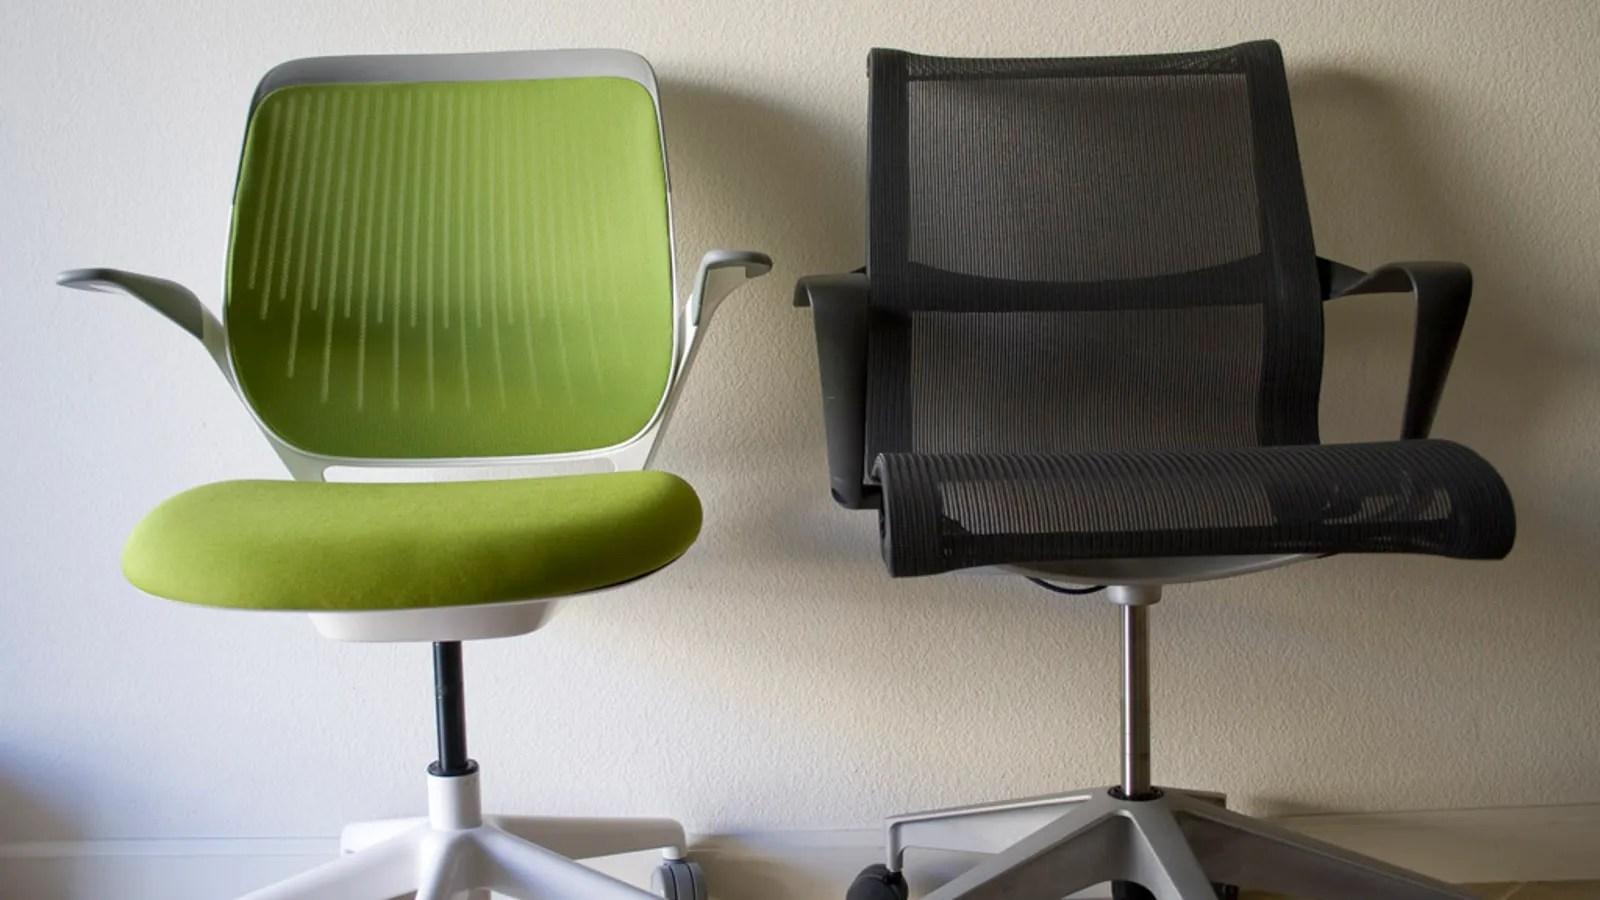 office chair vs task glass tables and chairs battlemodo herman miller setu steelcase cobi